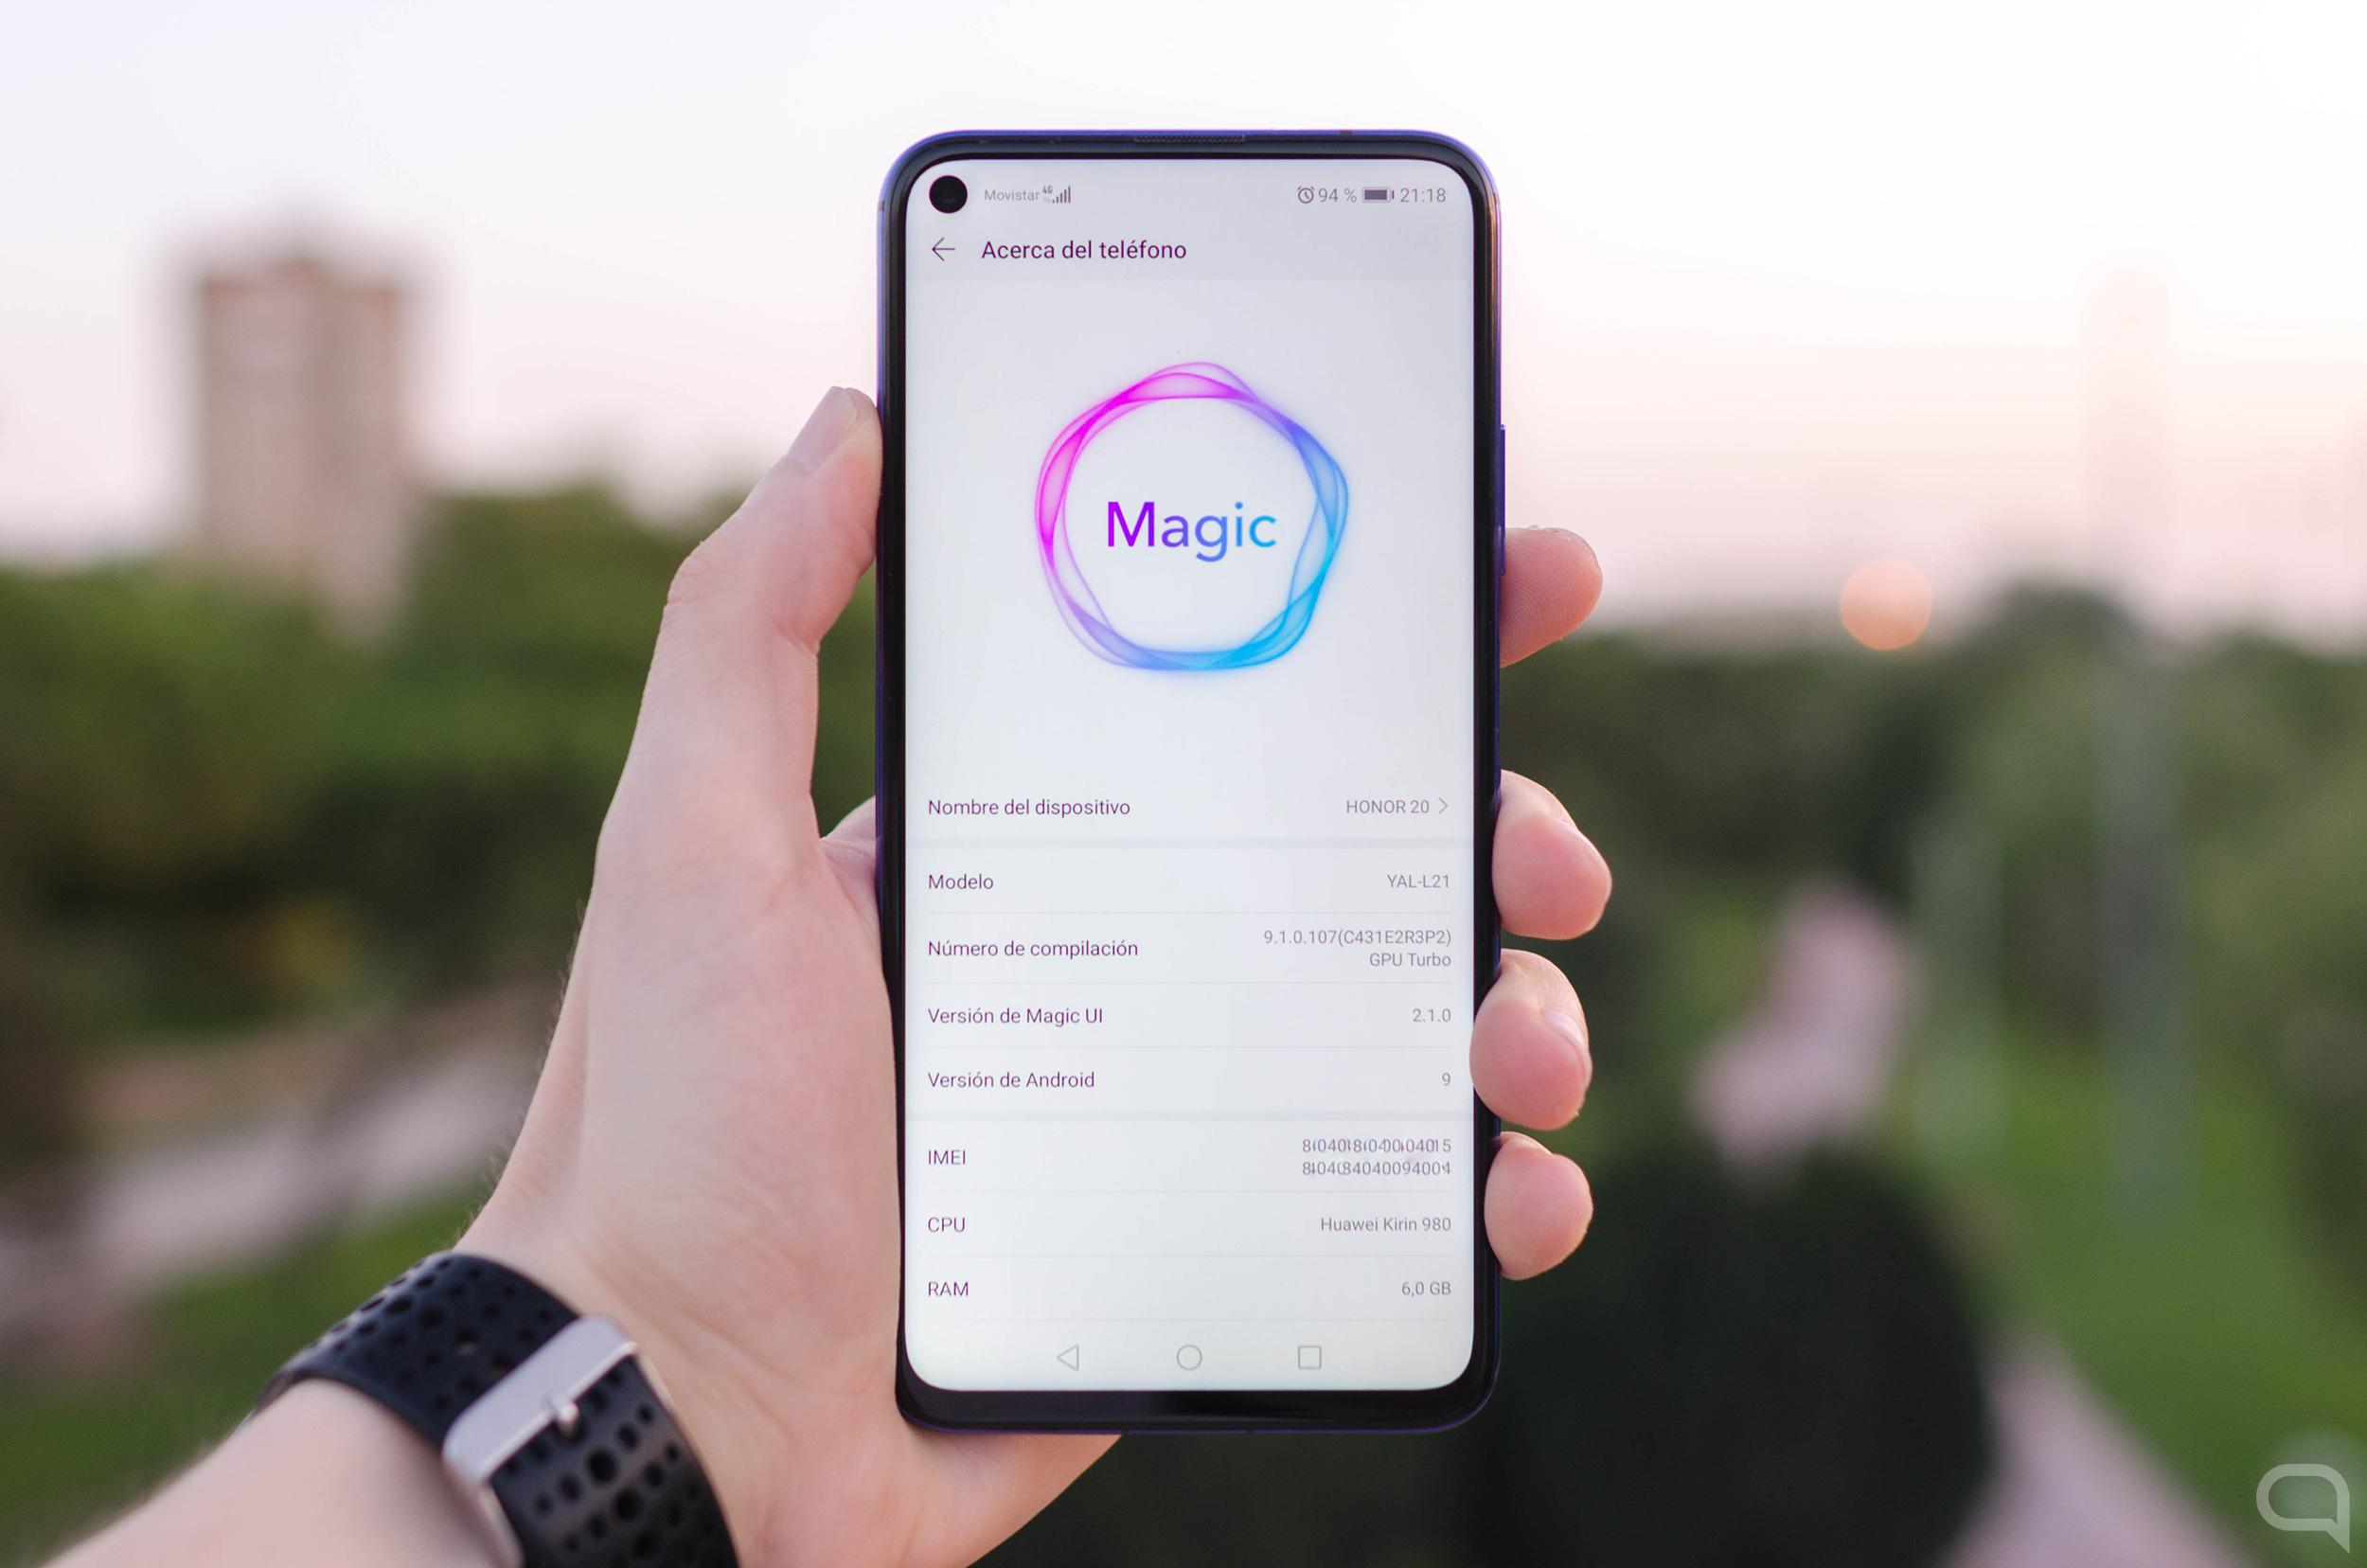 Honor Magic UI